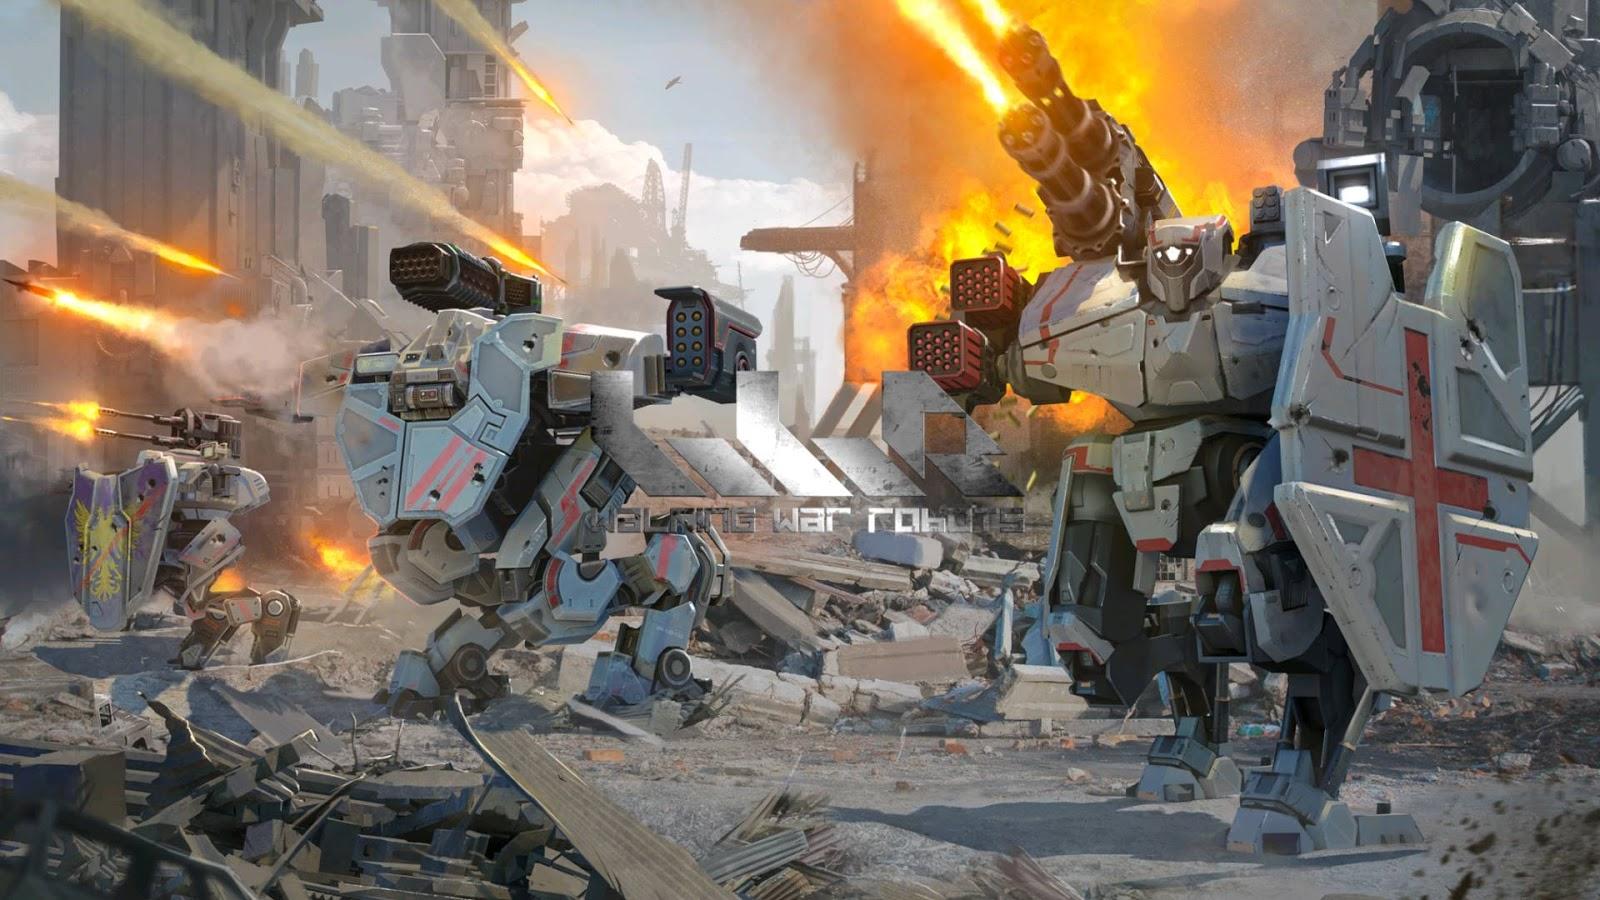 89 War Robots Wallpapers On Wallpapersafari